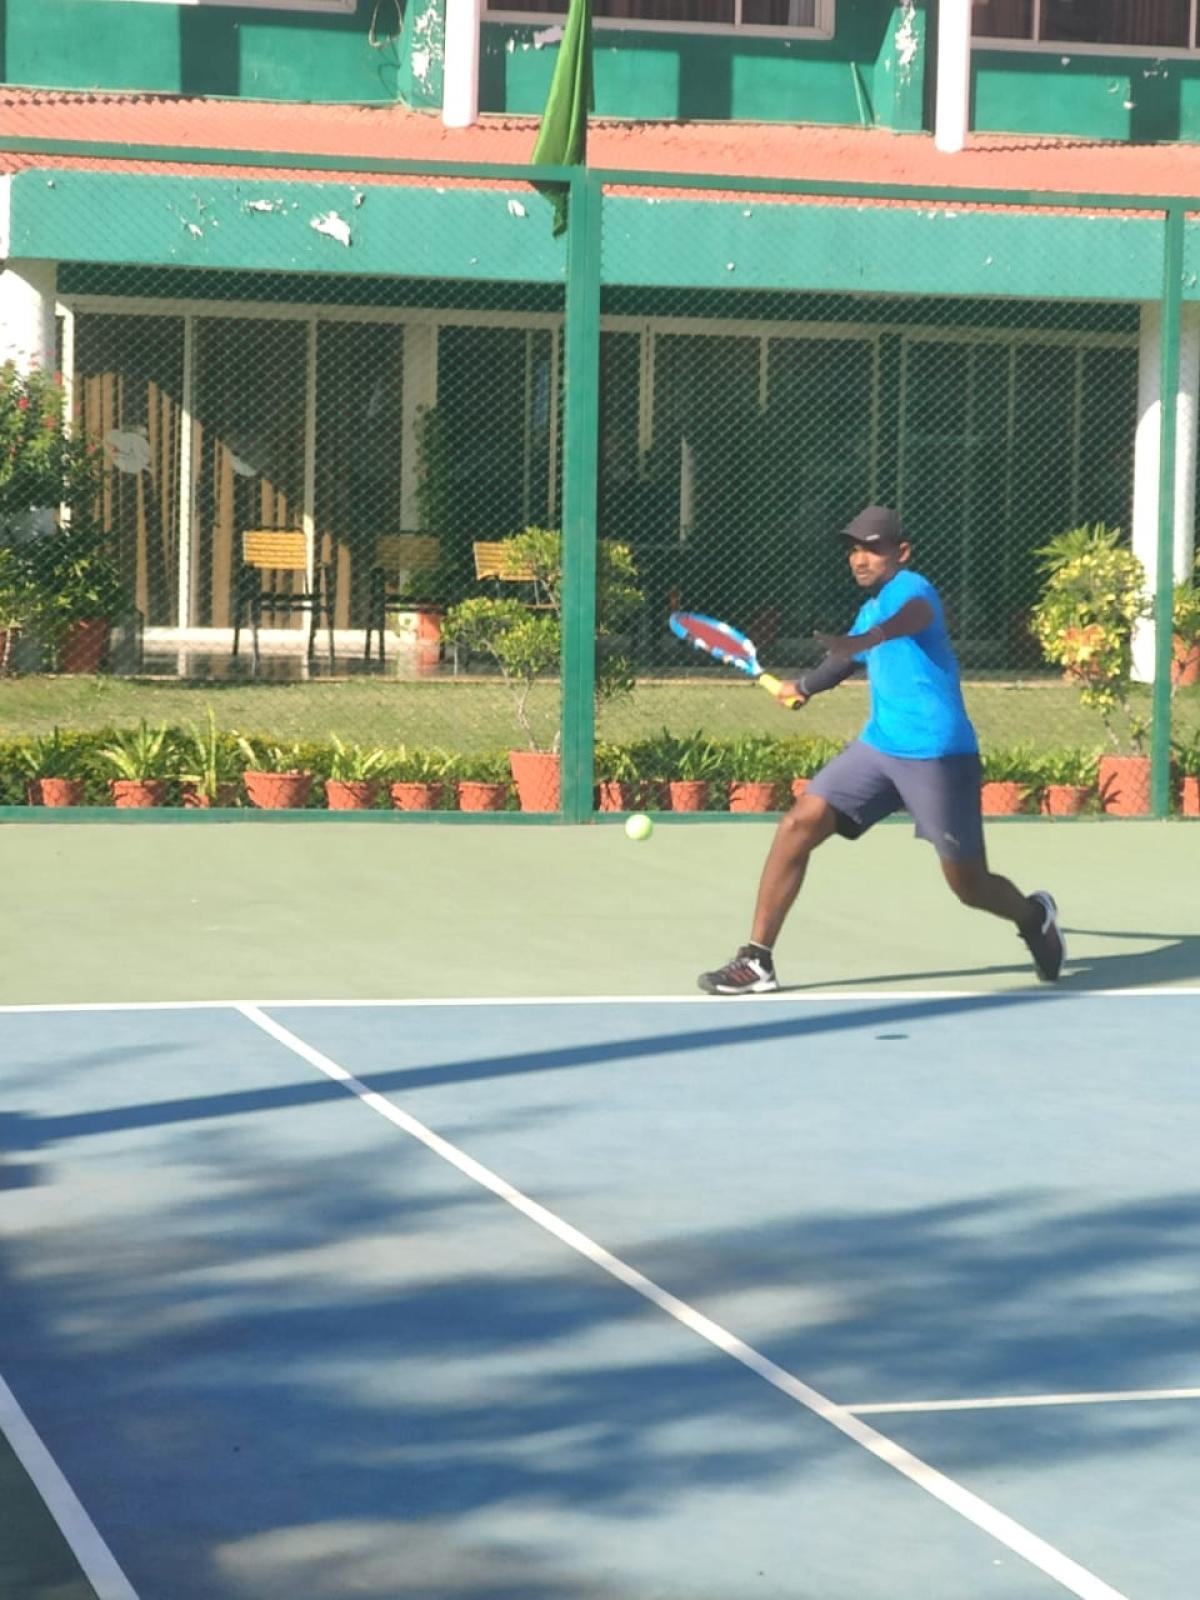 Madhya Pradesh: Four from Indore reach semifinals of Puneet Agarwal Memorial tennis tournament